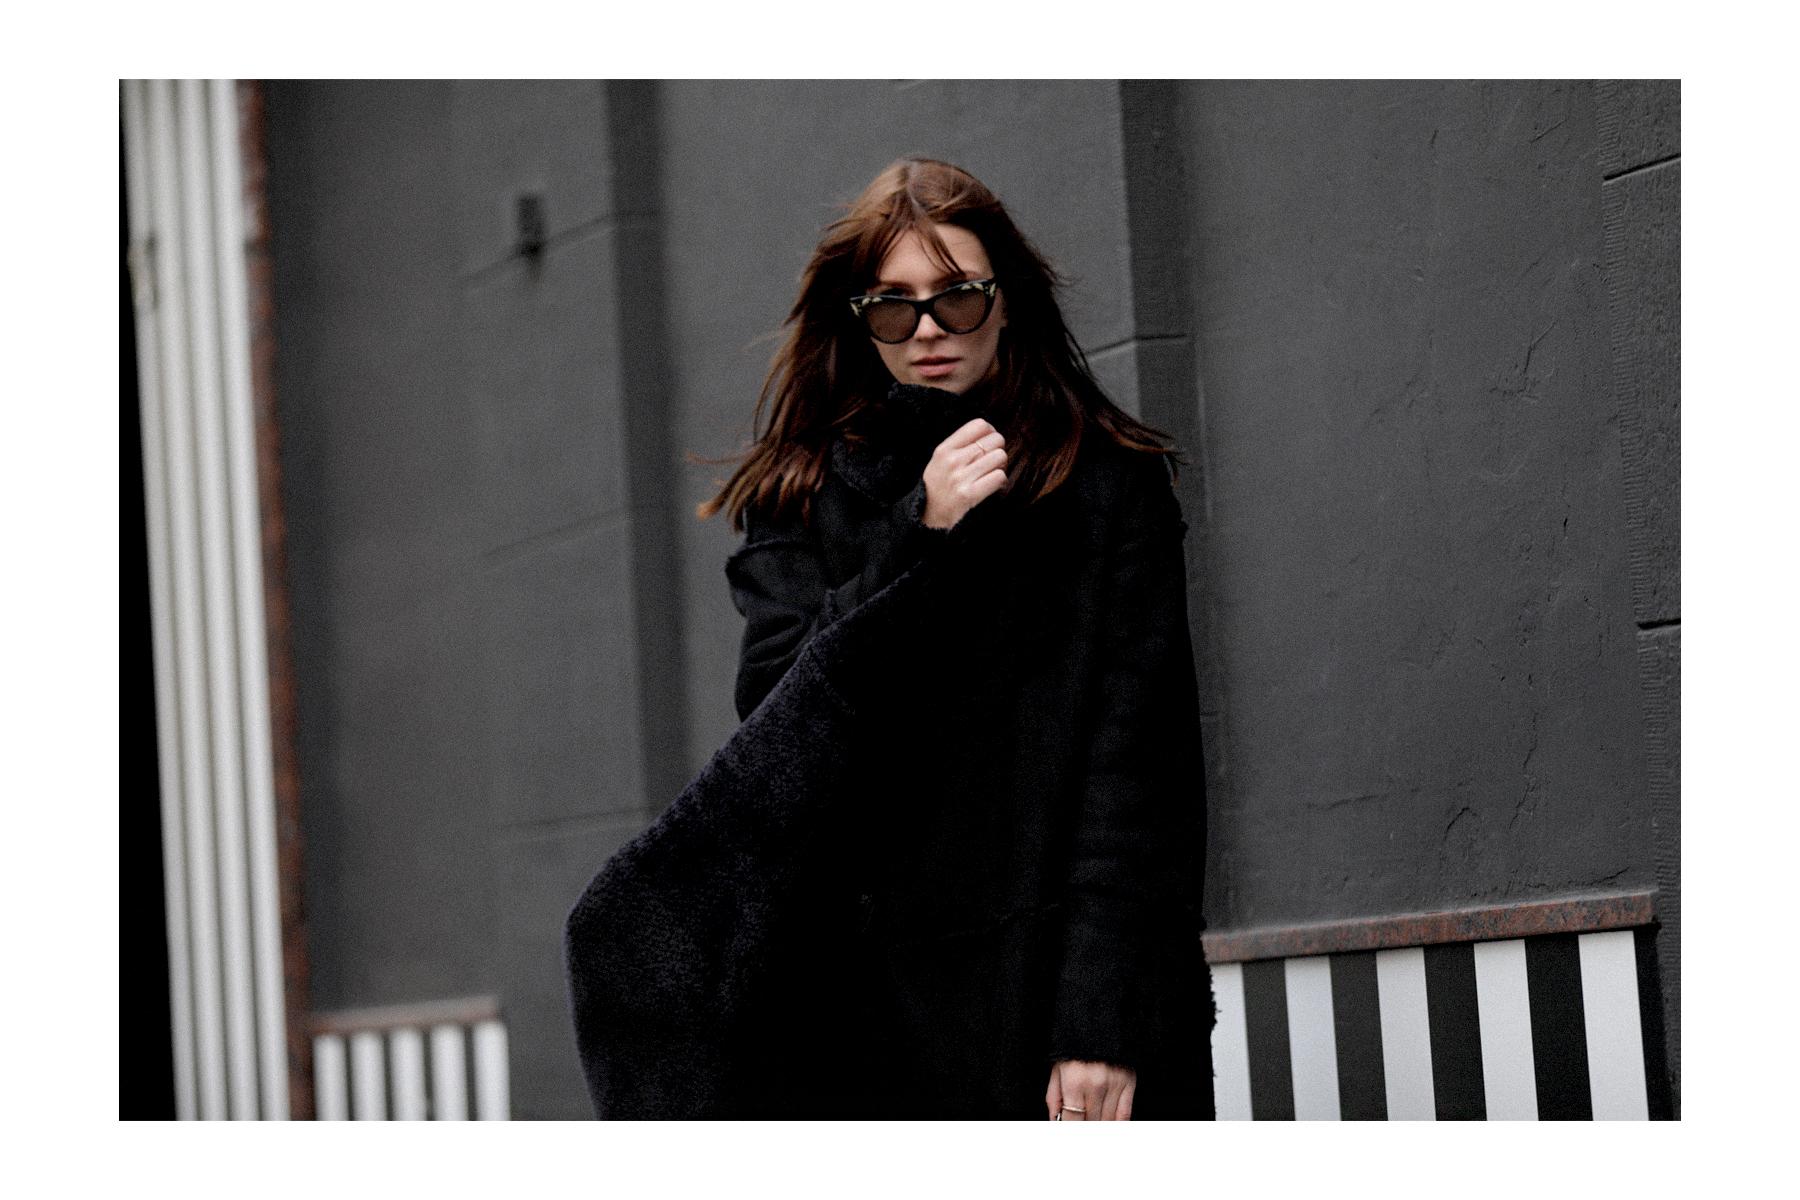 outfit black coat mango zara allblack allblackeverything winterlook fall winter fashion fashionblogger düsseldorf germany cats & dogs modeblog styleblog 2